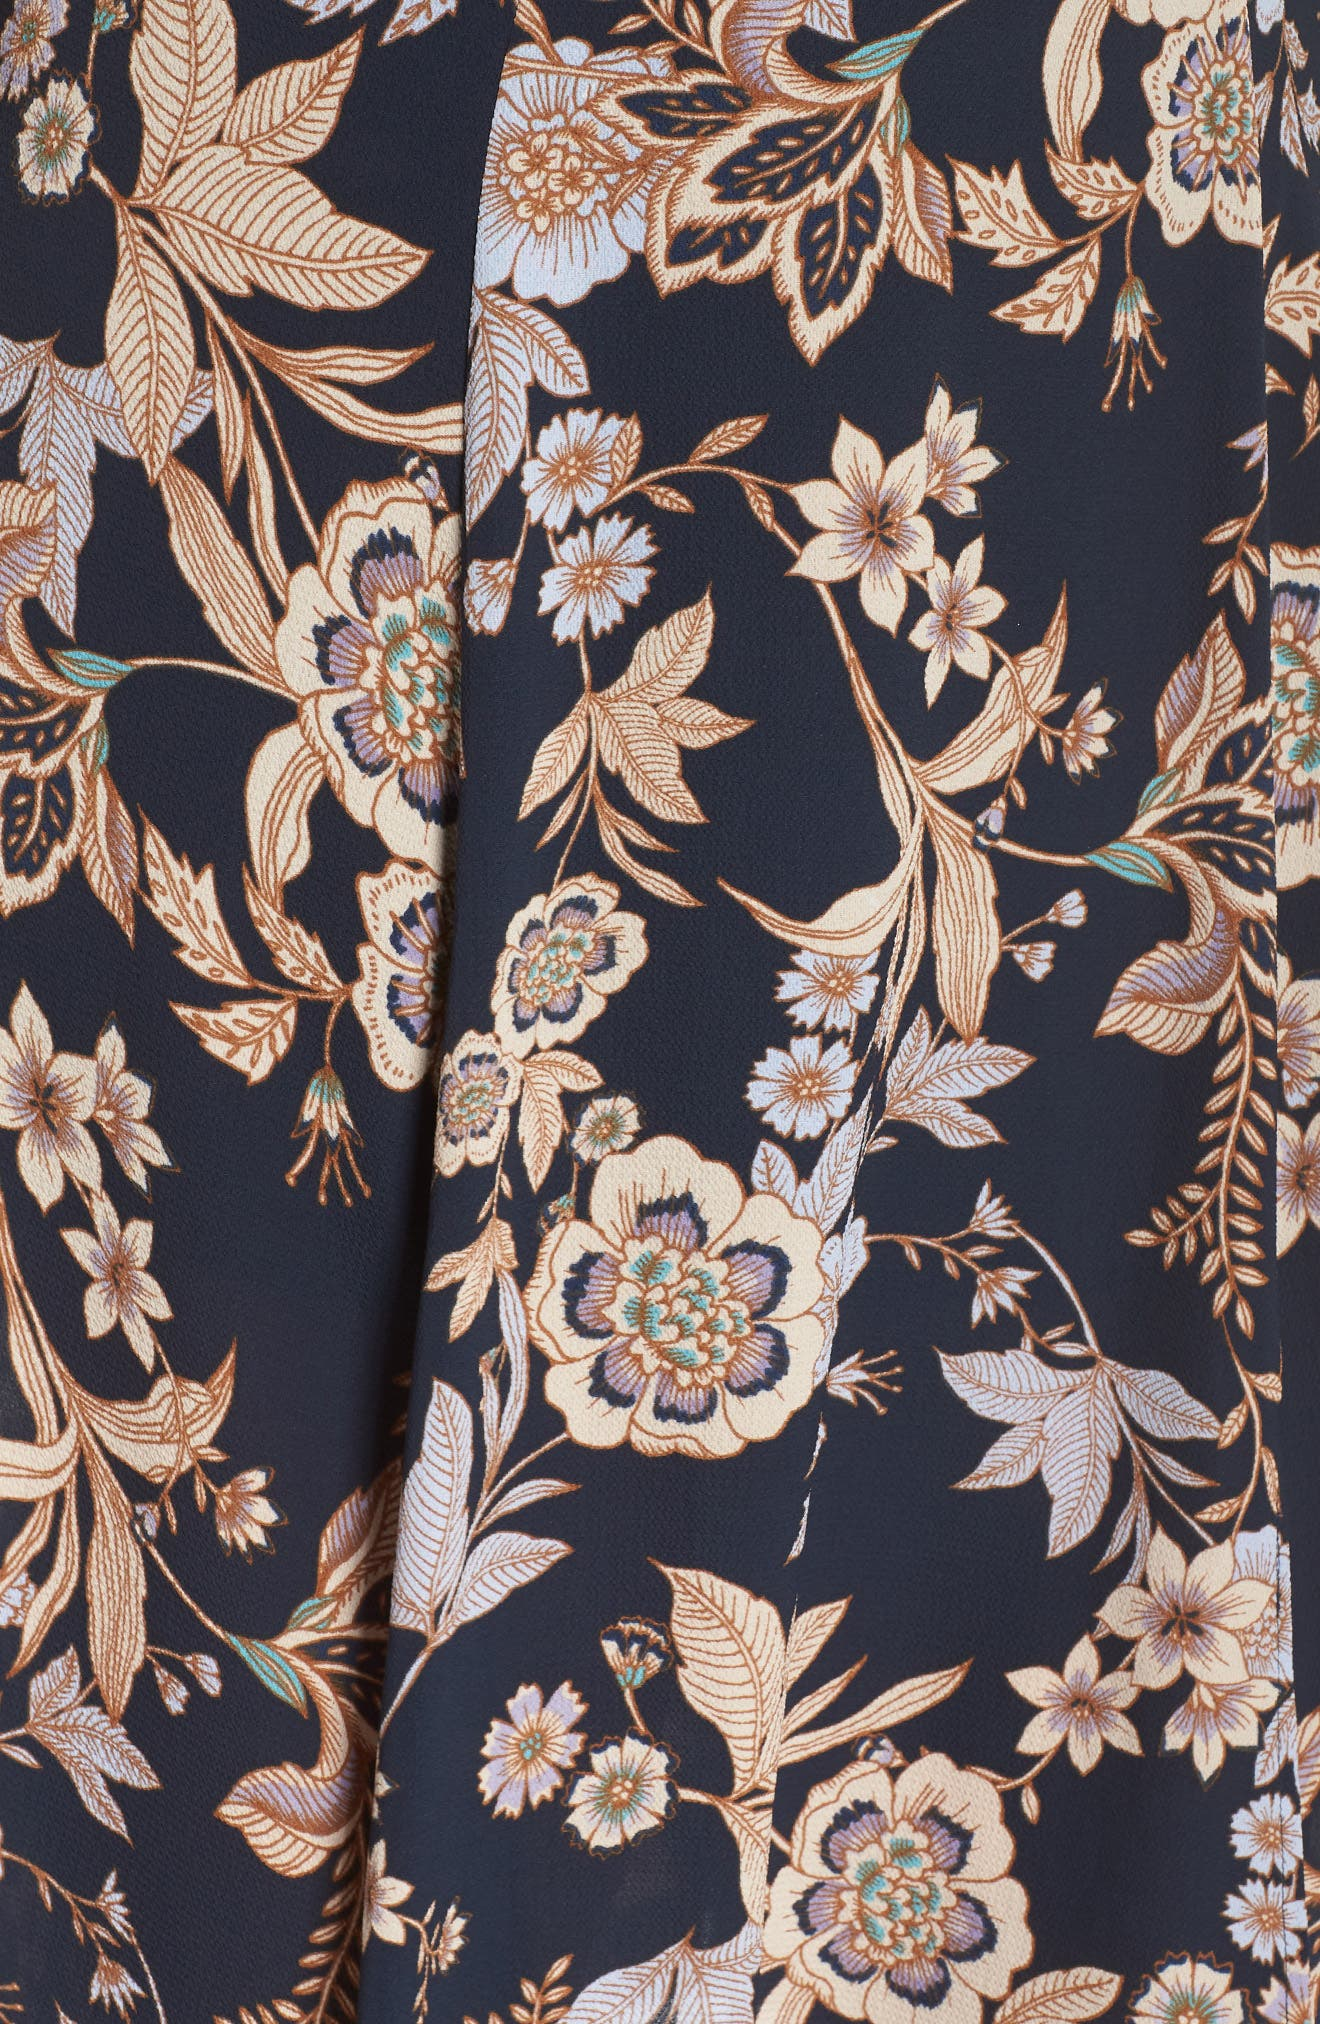 Floral Fit & Flare Dress,                             Alternate thumbnail 6, color,                             410